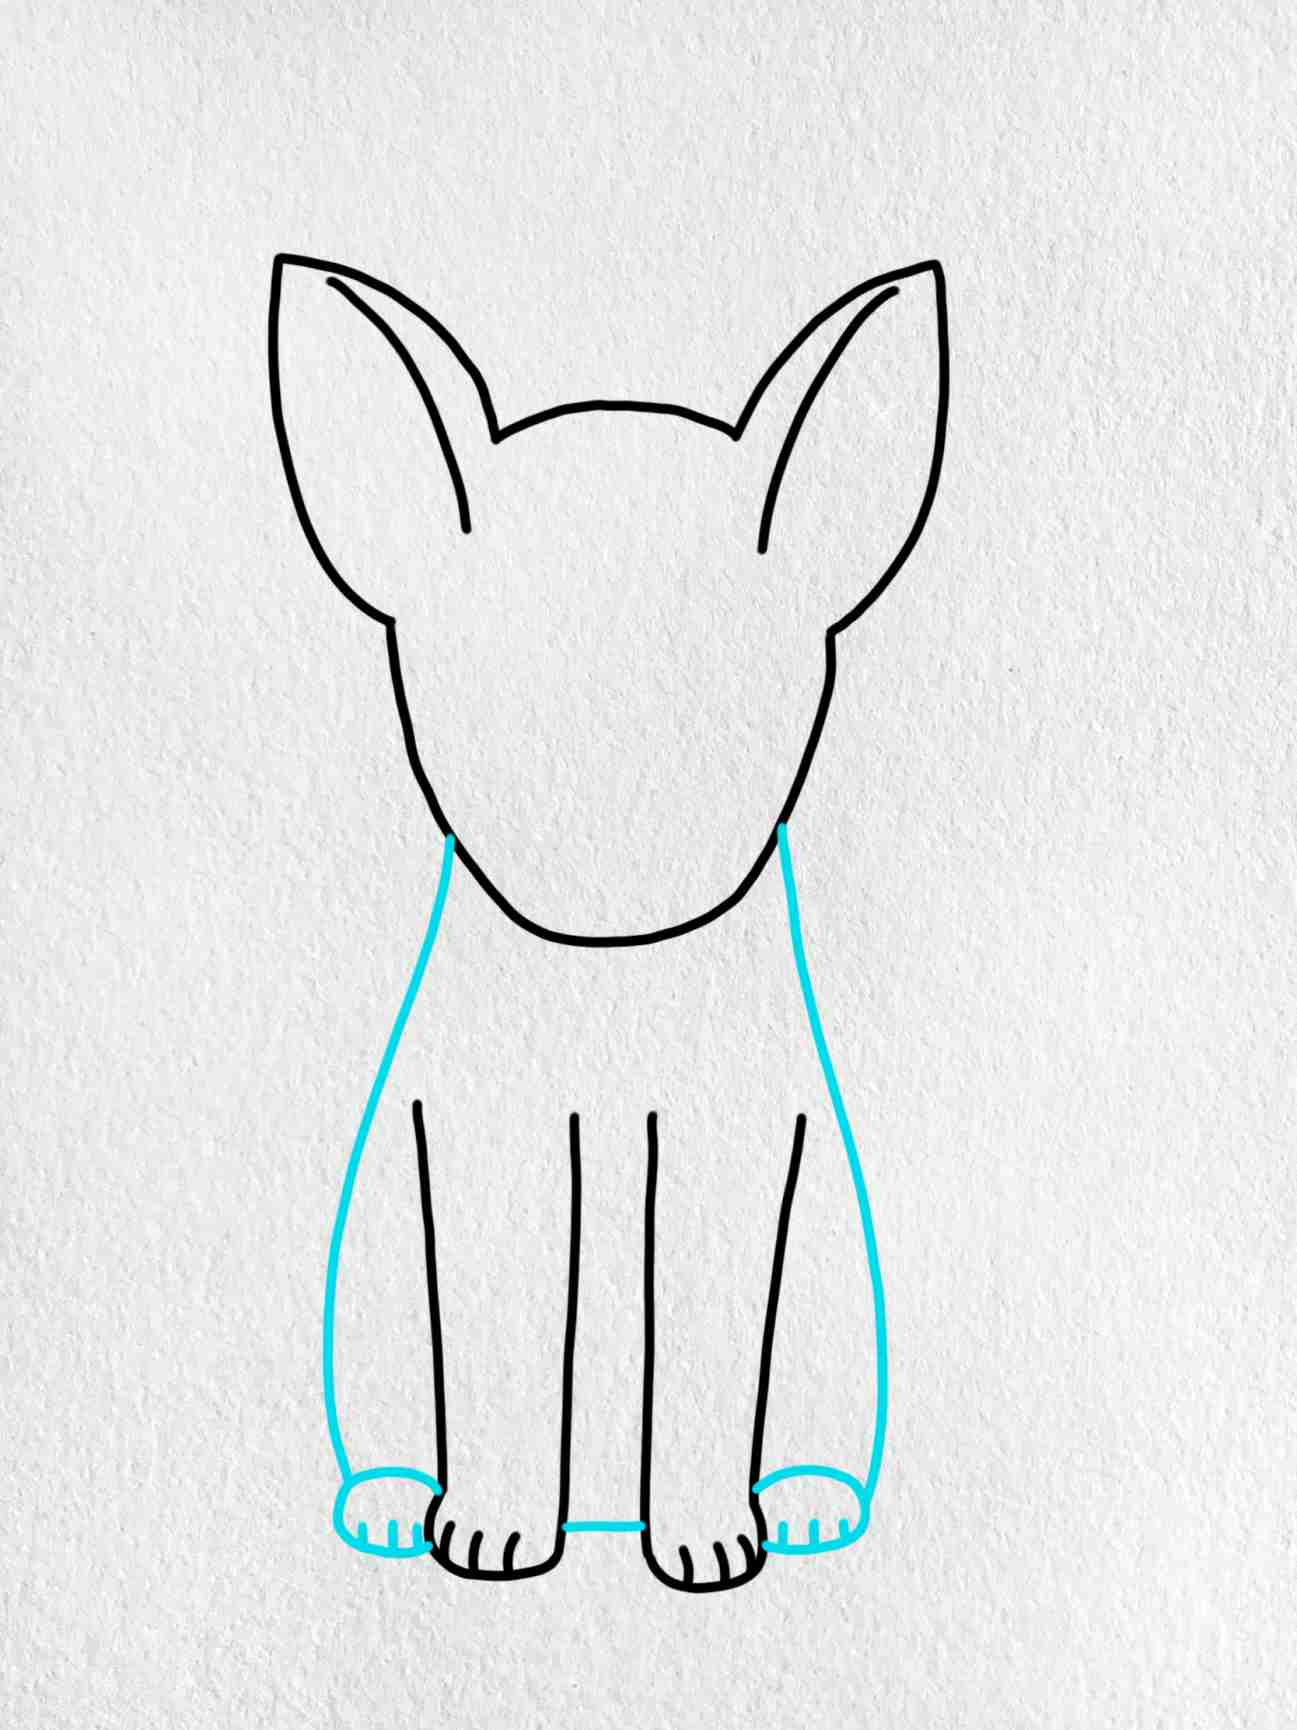 How To Draw A German Shepherd: Step 4